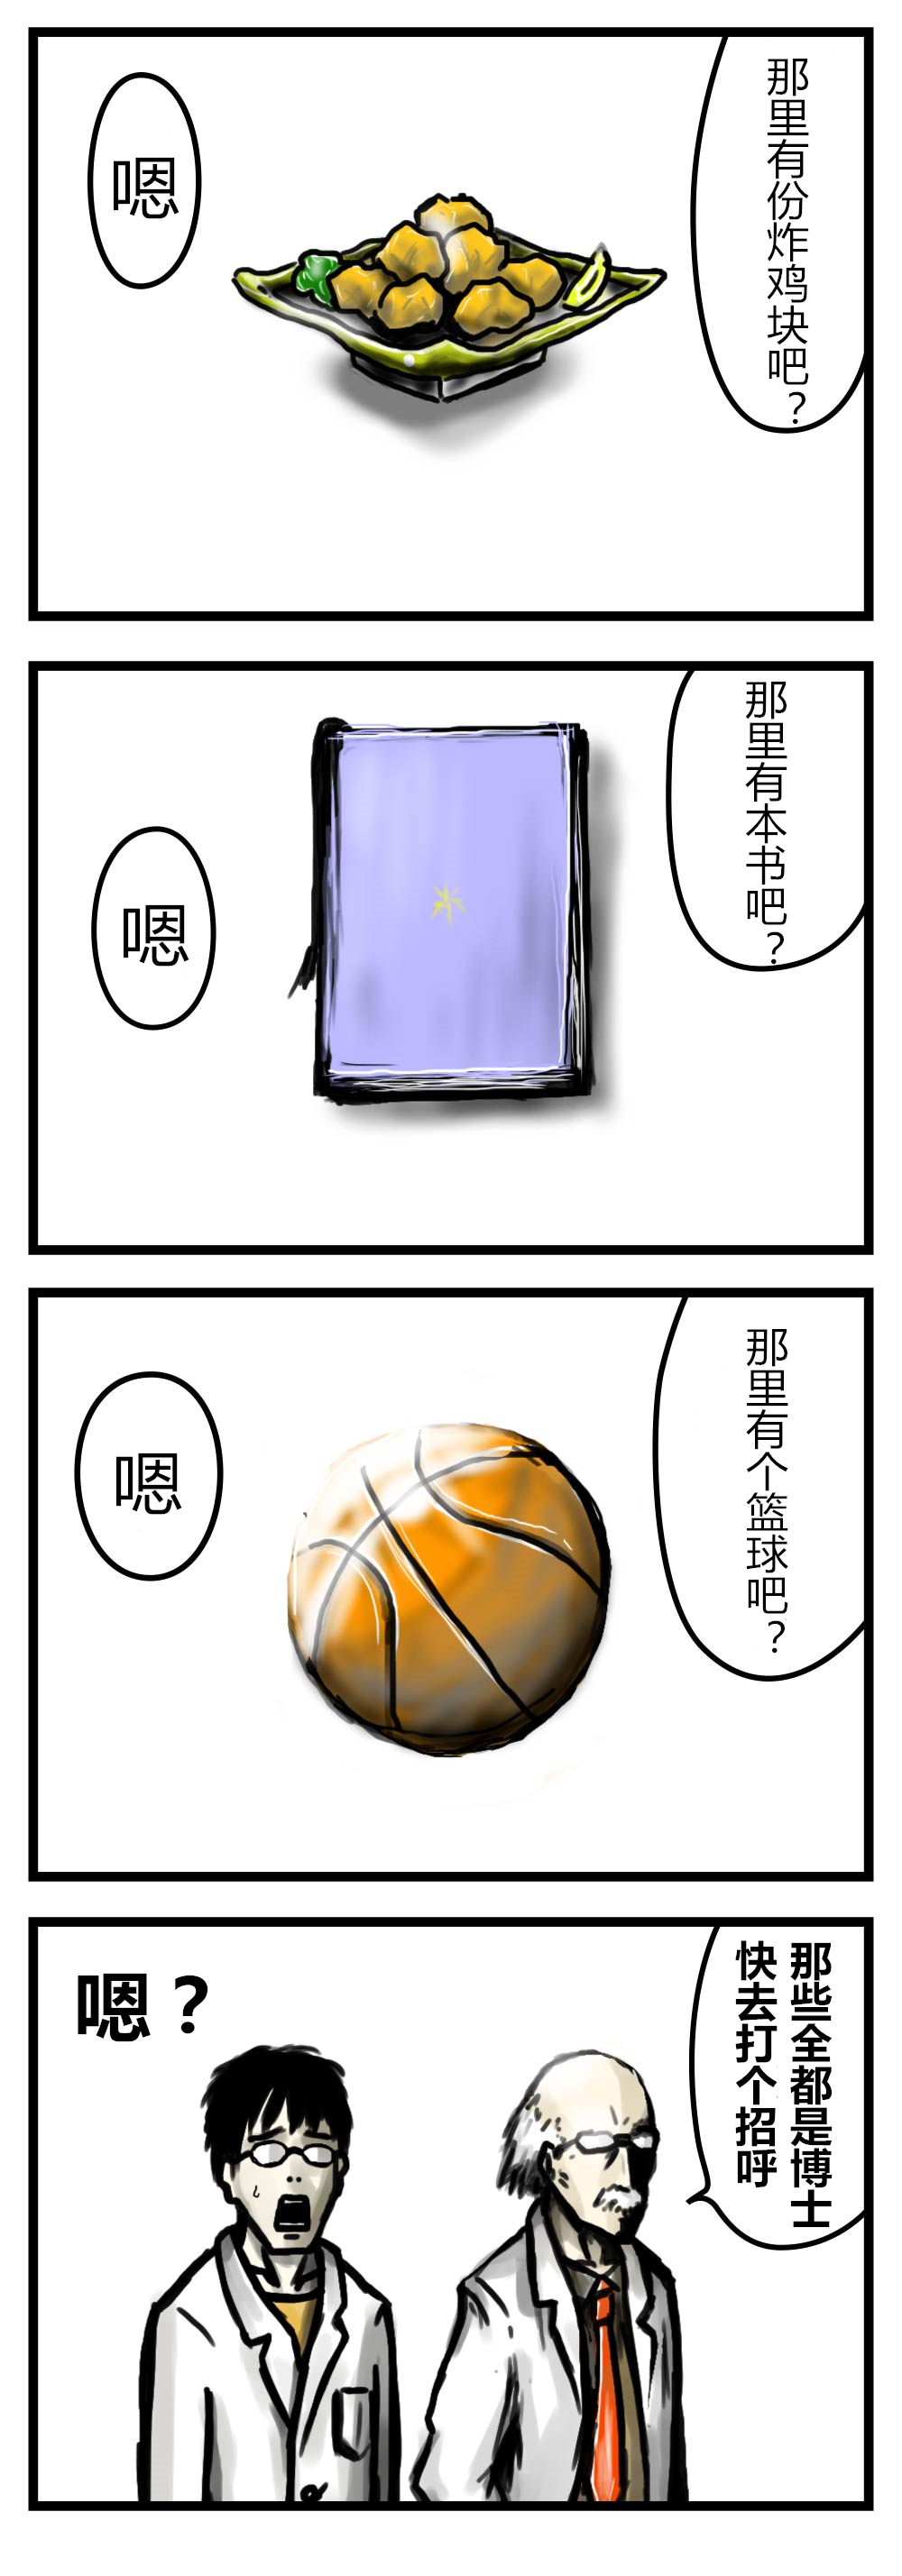 staff_jp_4koma.jpg